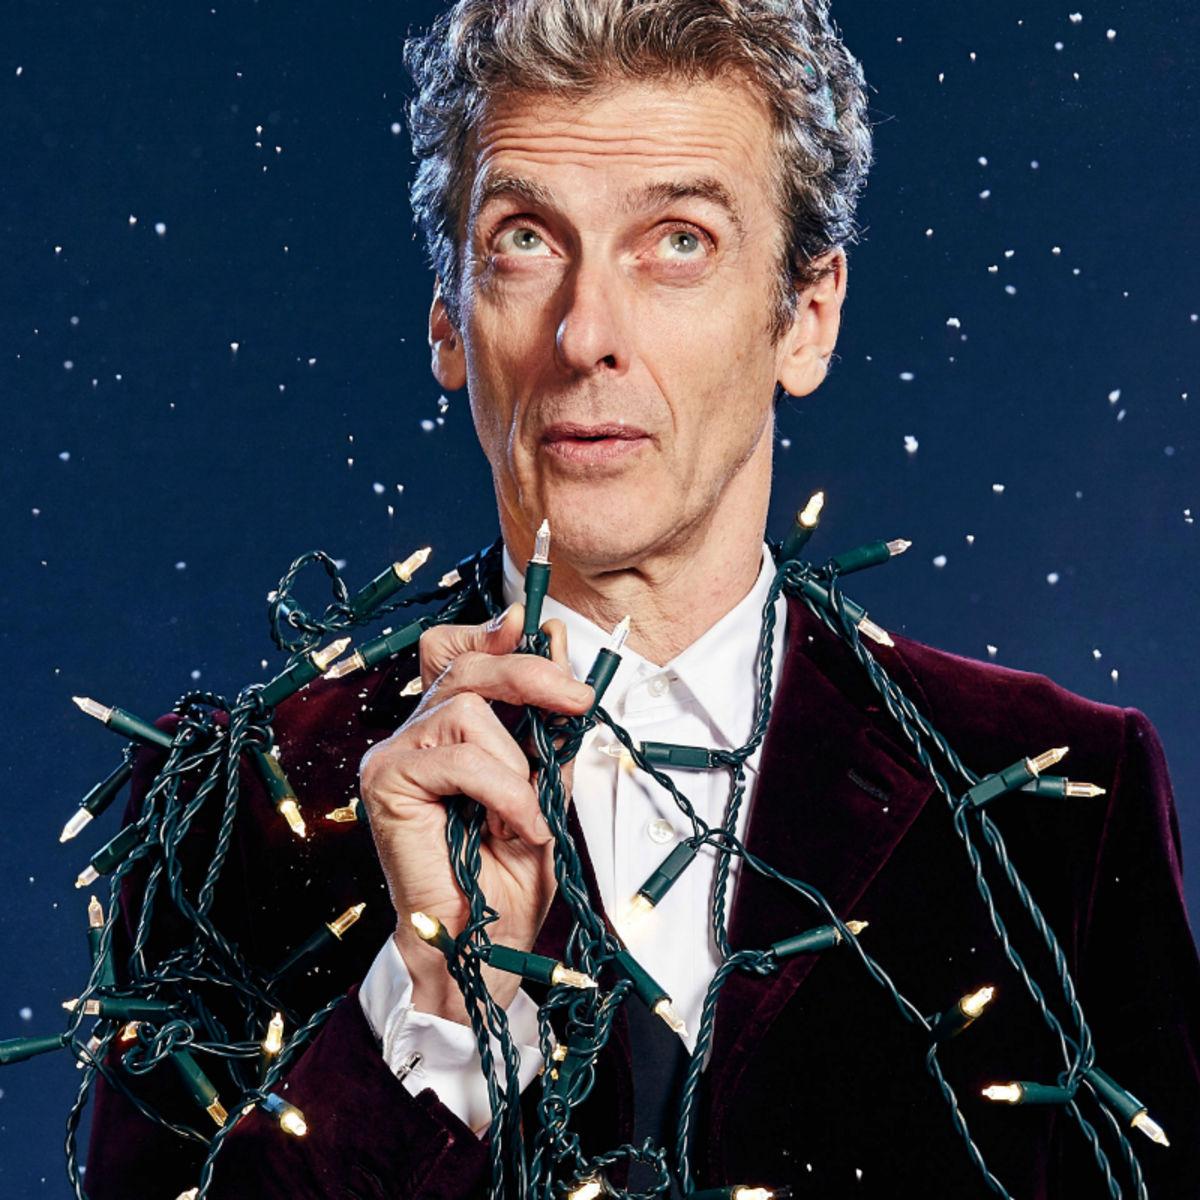 Doctor-Who-Xmas-2016.jpg